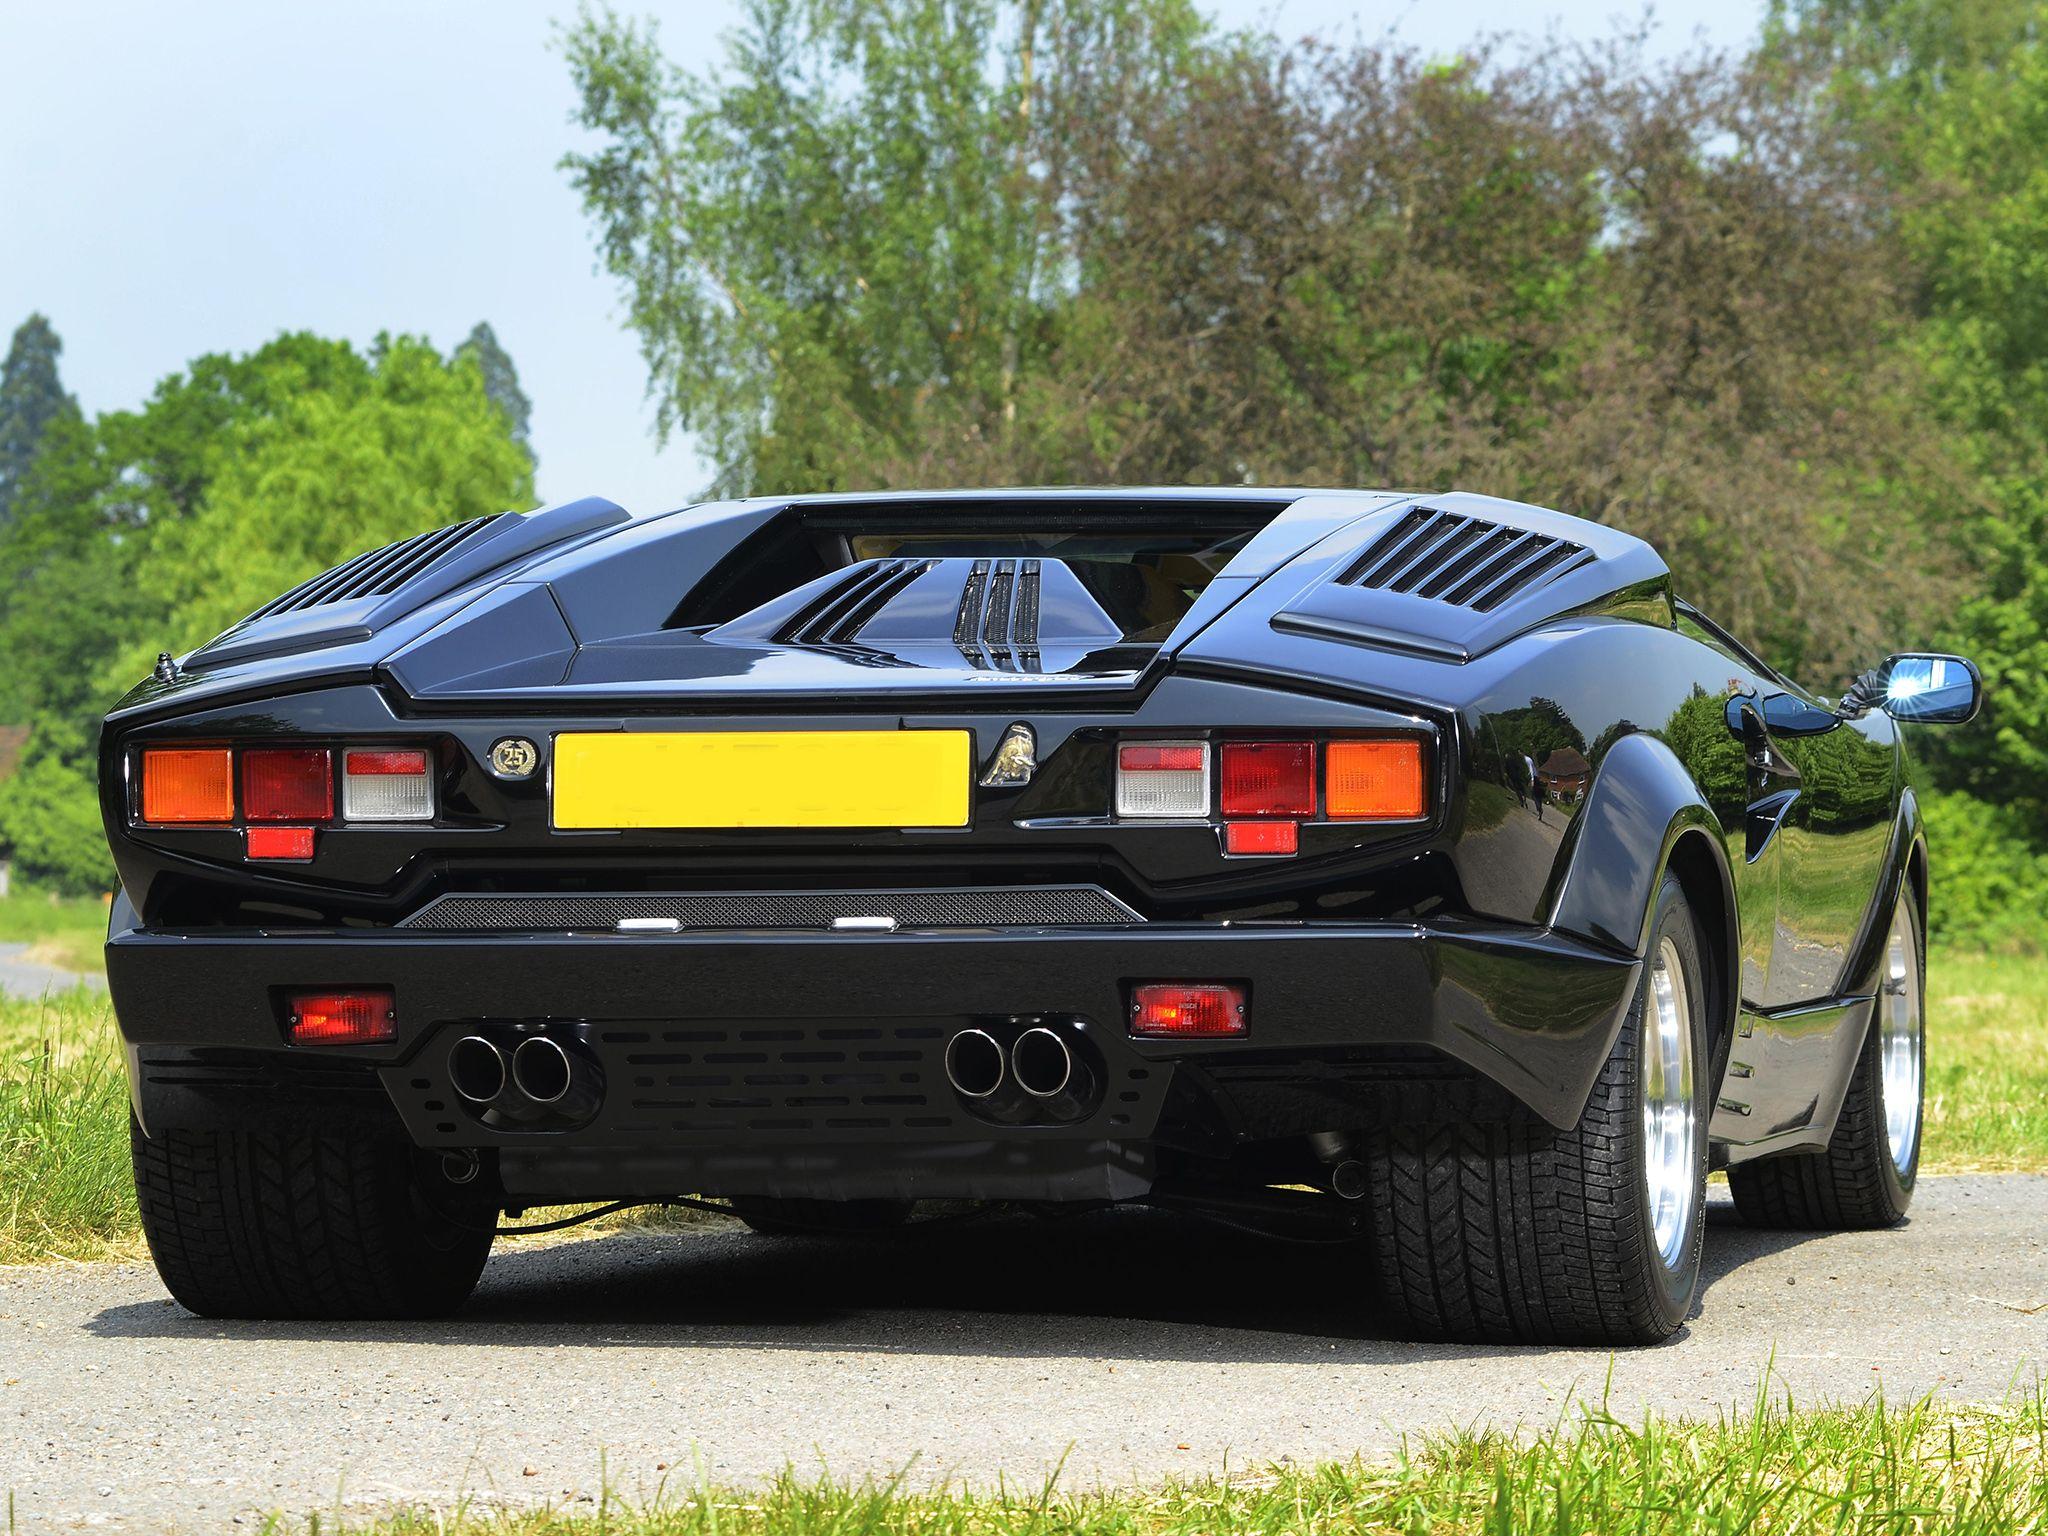 b9aaf6e517c60a4c944b845b864051bc Elegant Lamborghini Countach 25th Anniversary Specs Cars Trend